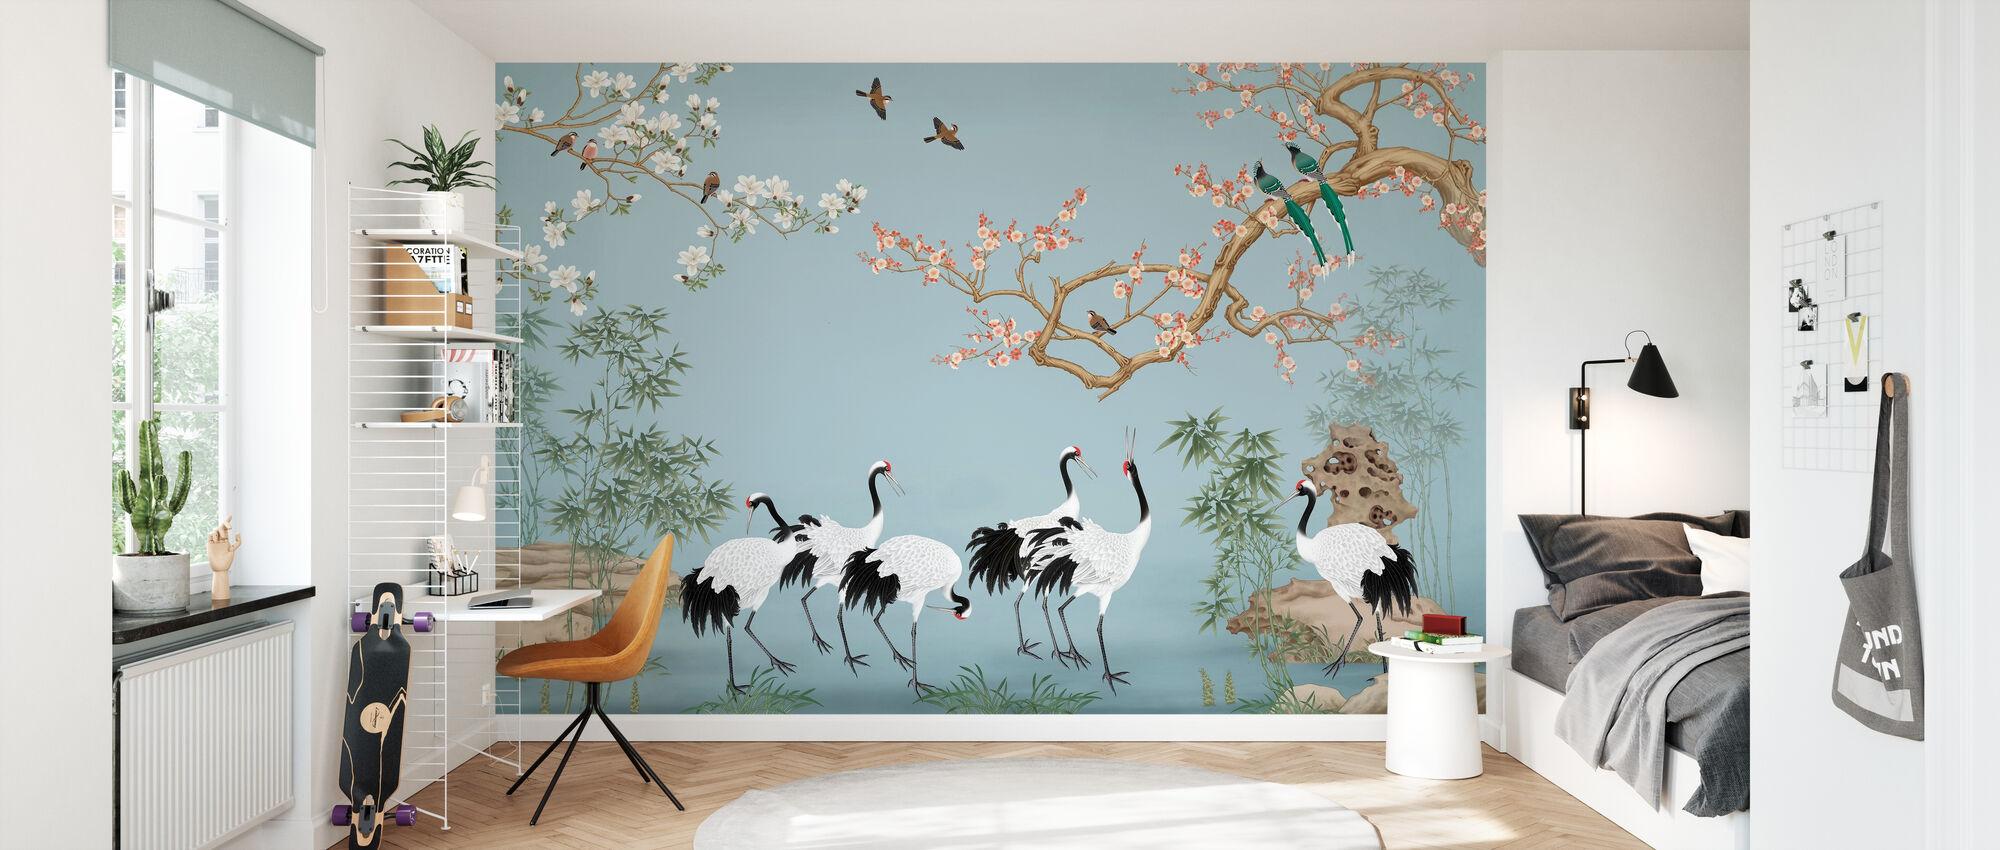 Stomping Ground - Azure - Wallpaper - Kids Room